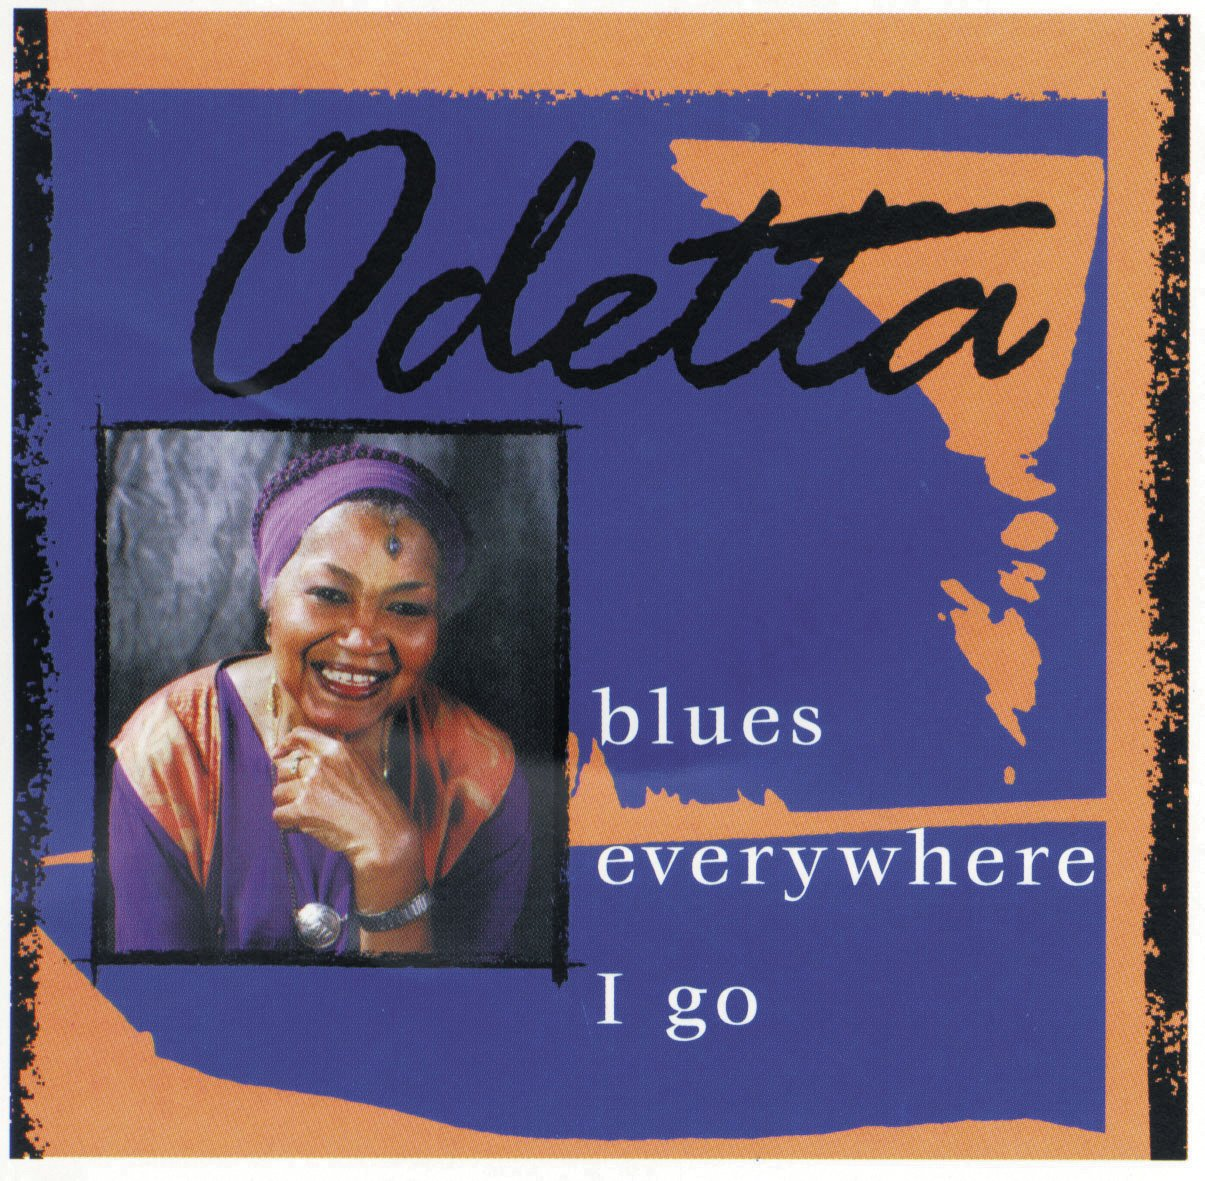 Blues Everywhere I Go by M.C.